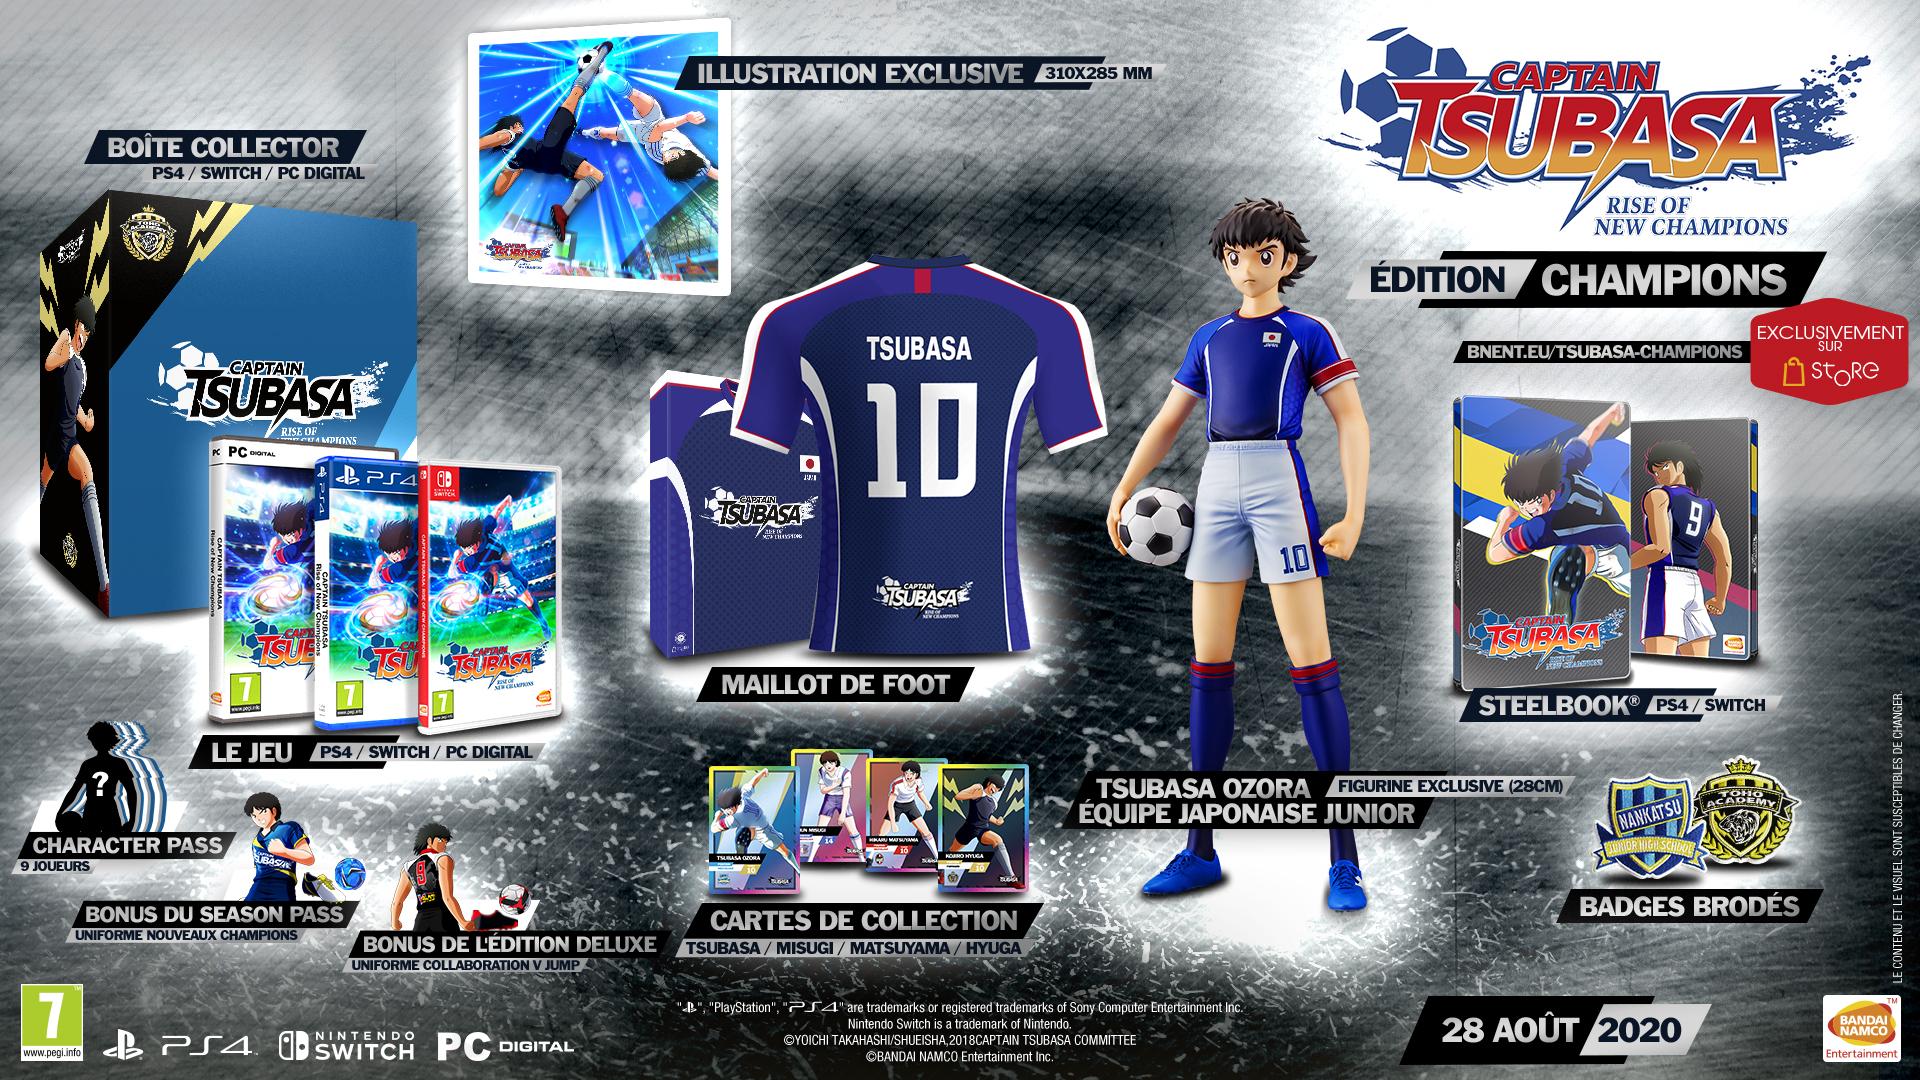 Captain Tsubasa OLIVE et TOM arcade football  - Page 3 Captain-tsubasa-beautyshot-champions-edition-no-custo-fra-1590411999-fc7